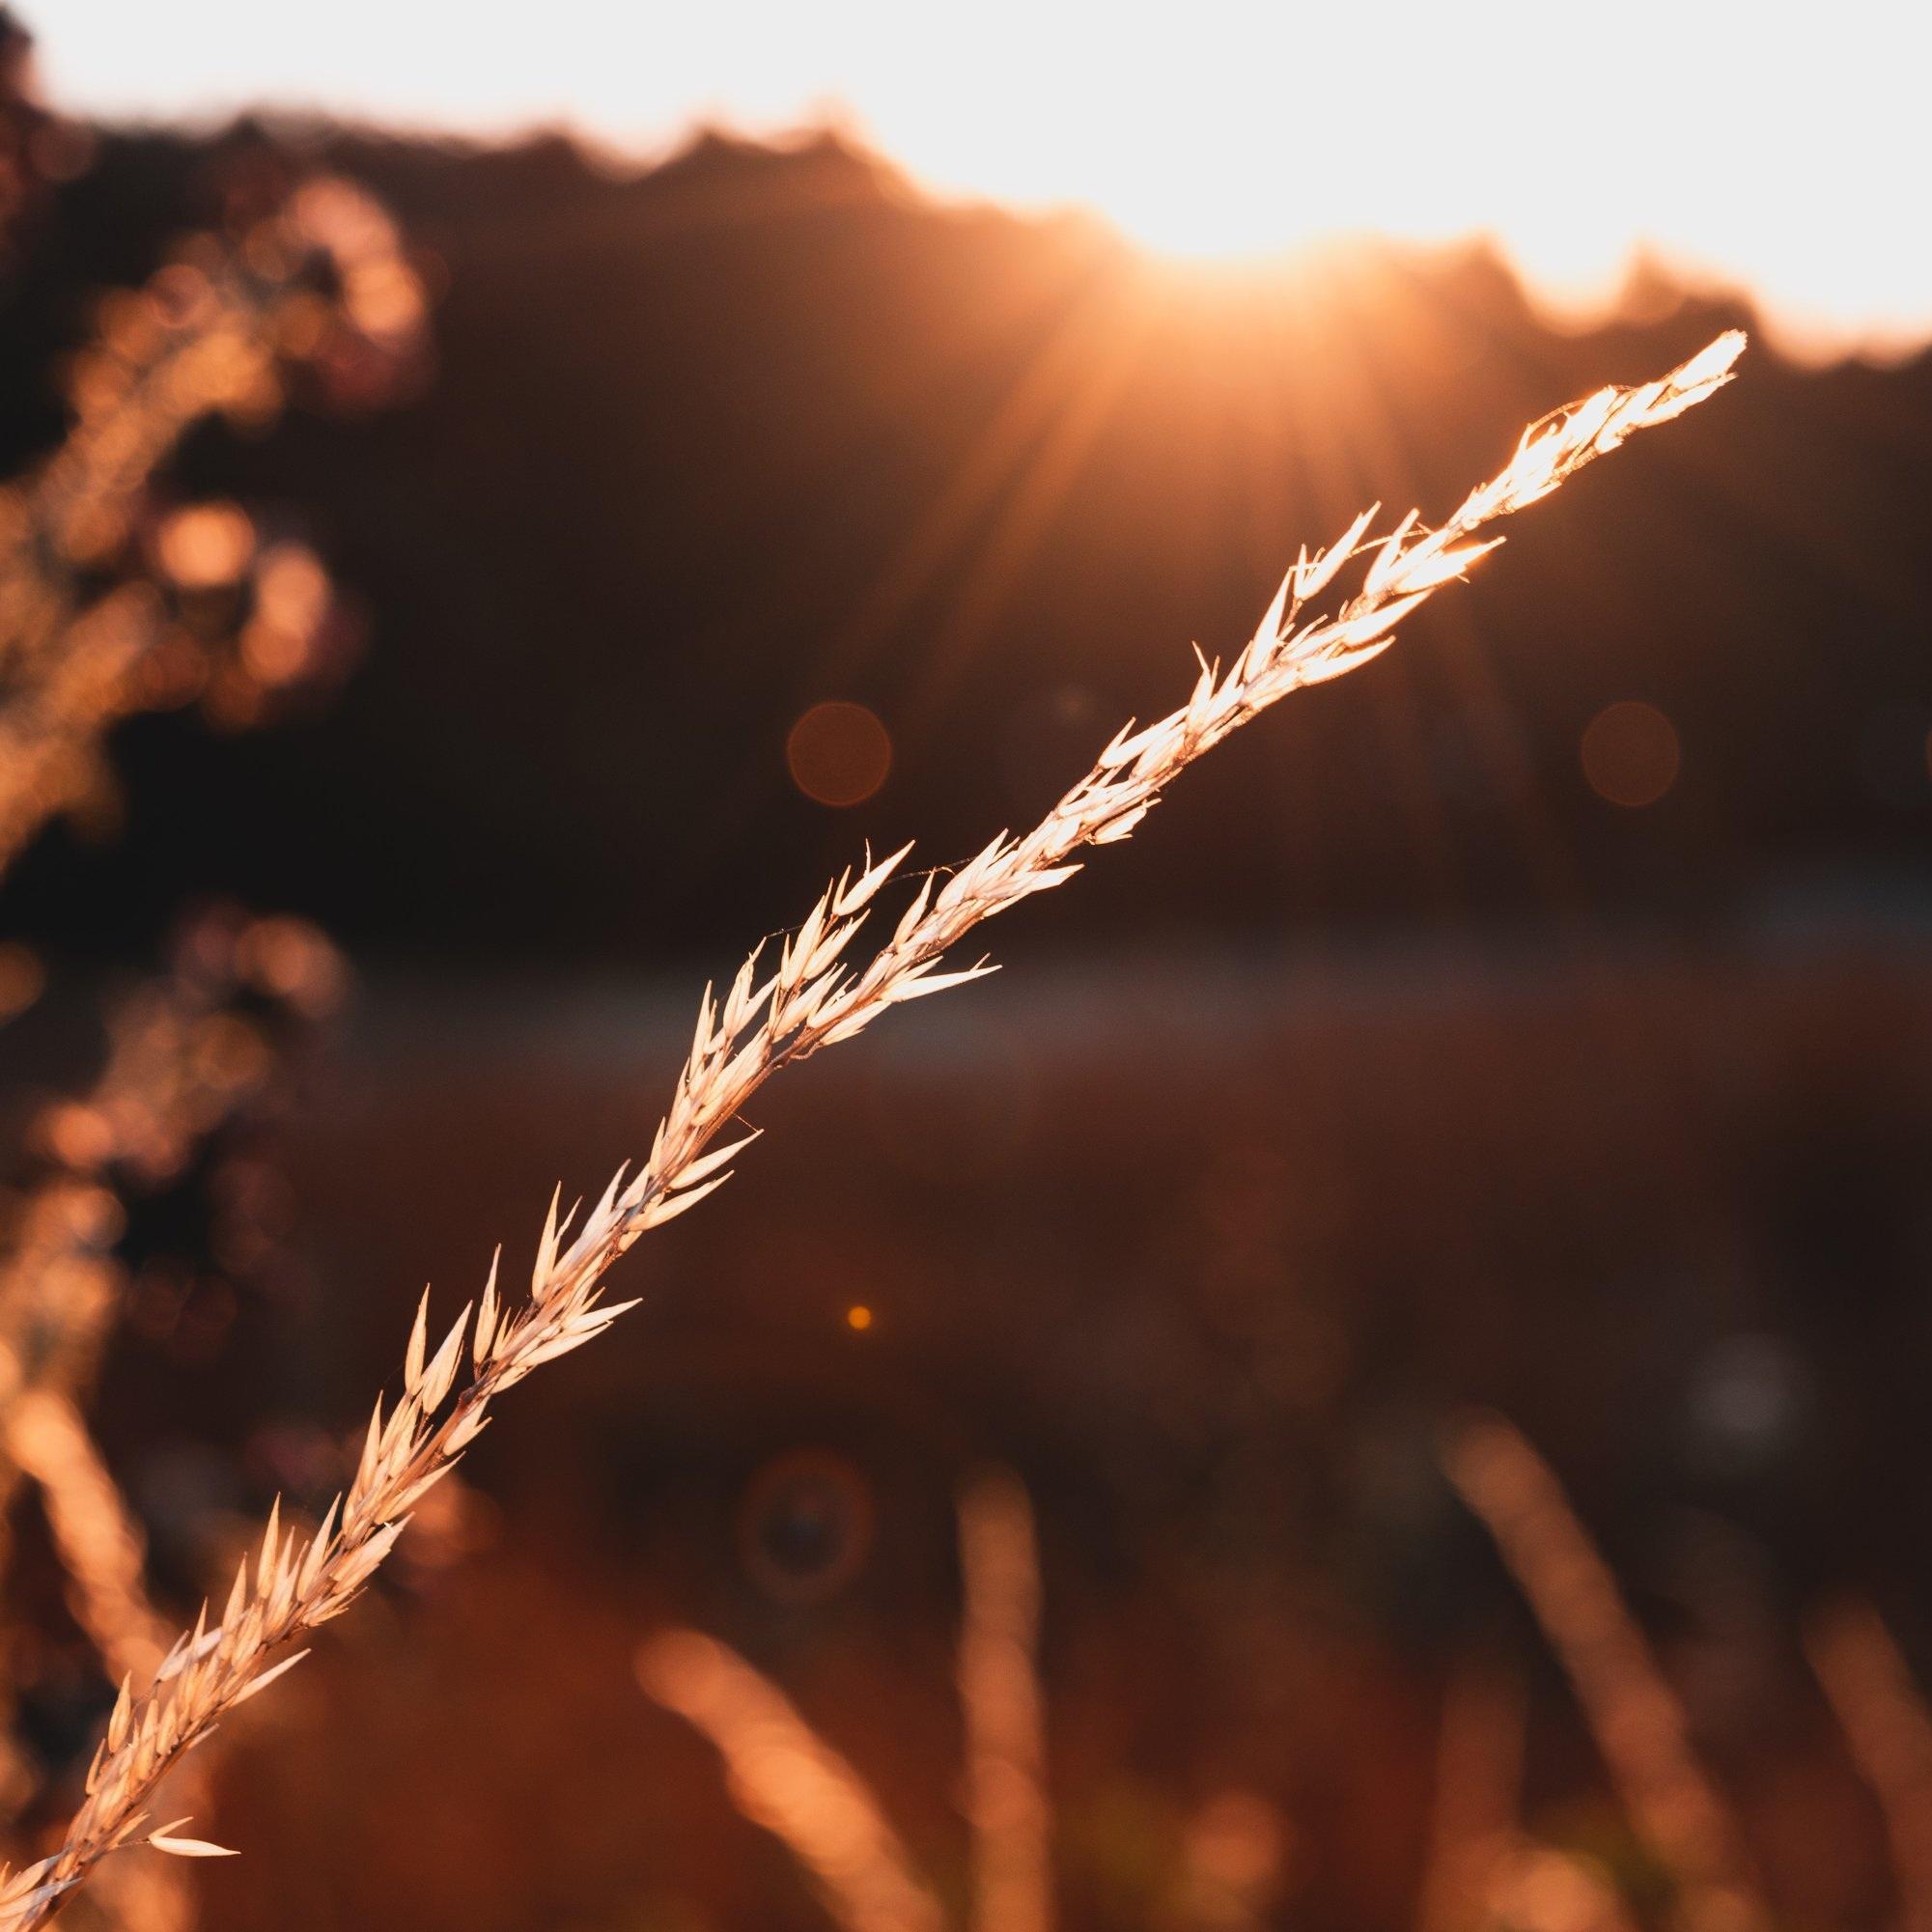 blur-cereal-close-up-1272364.jpg